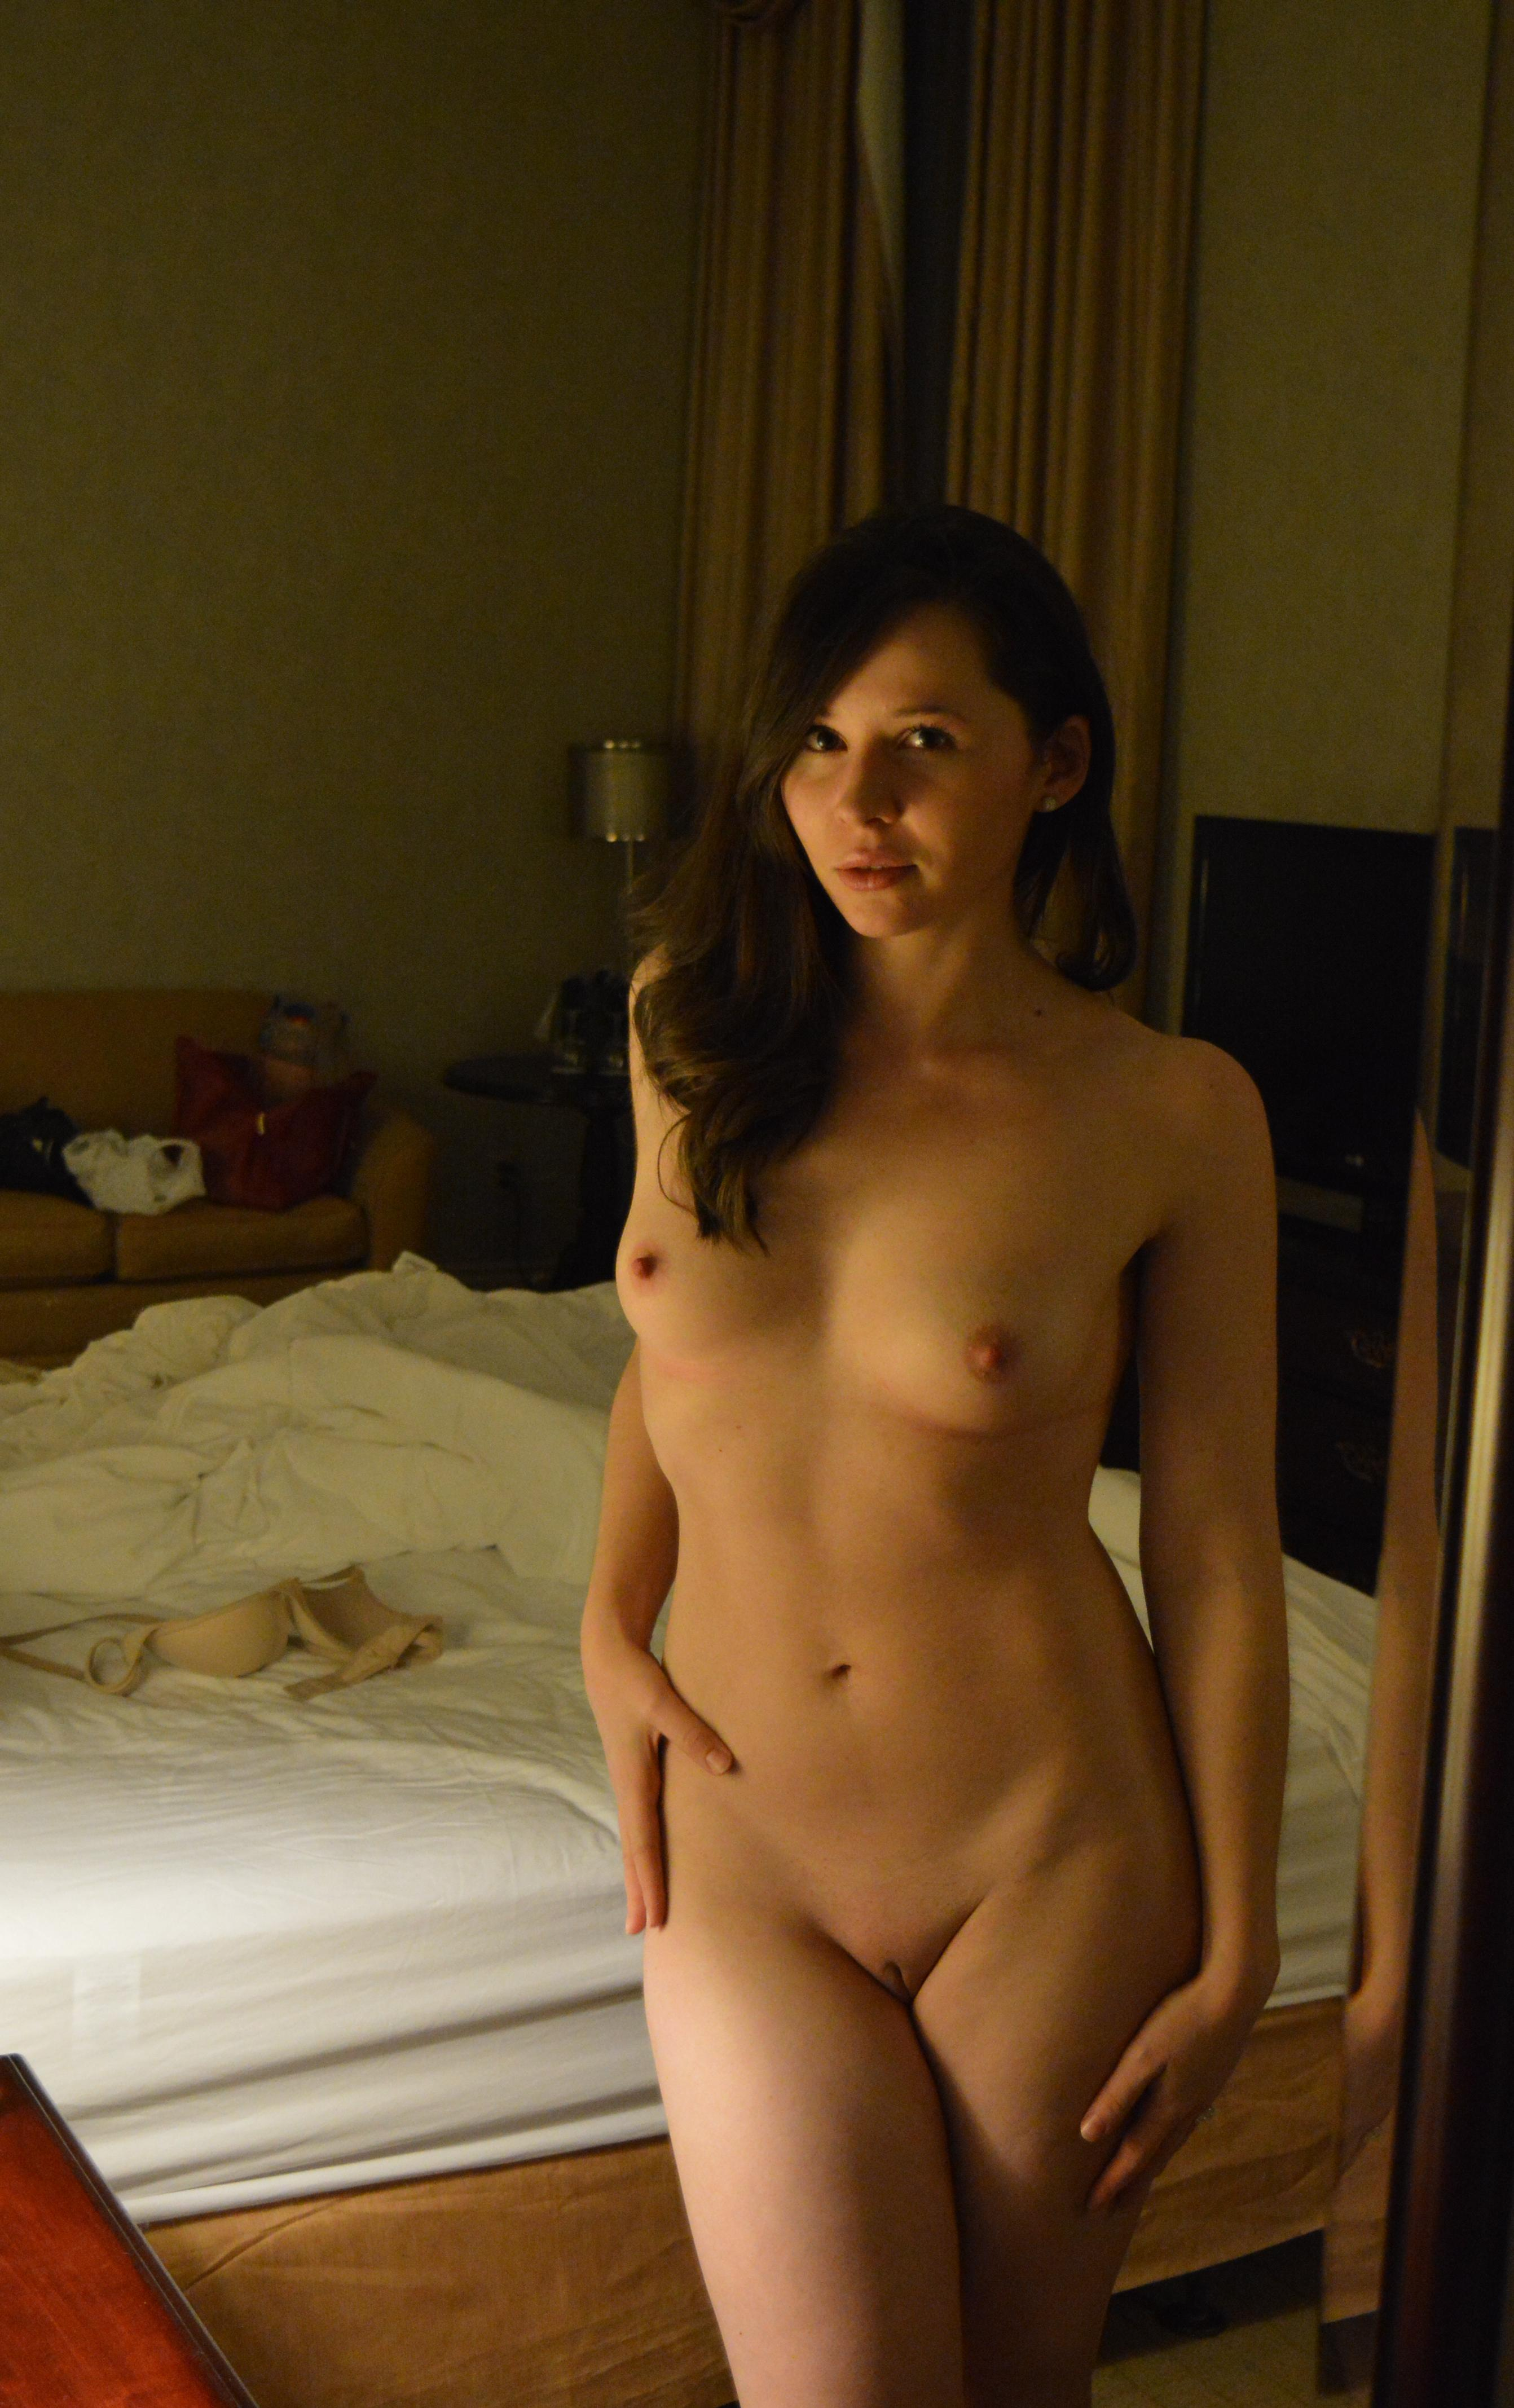 lesbian orgy free porn dino tube newest Wife Amateur Brunette MILF Nude Slut Degraded Forced Nude Slave Readytofuck Used Caption Mature Hot Fucktoy Sexy Bitch